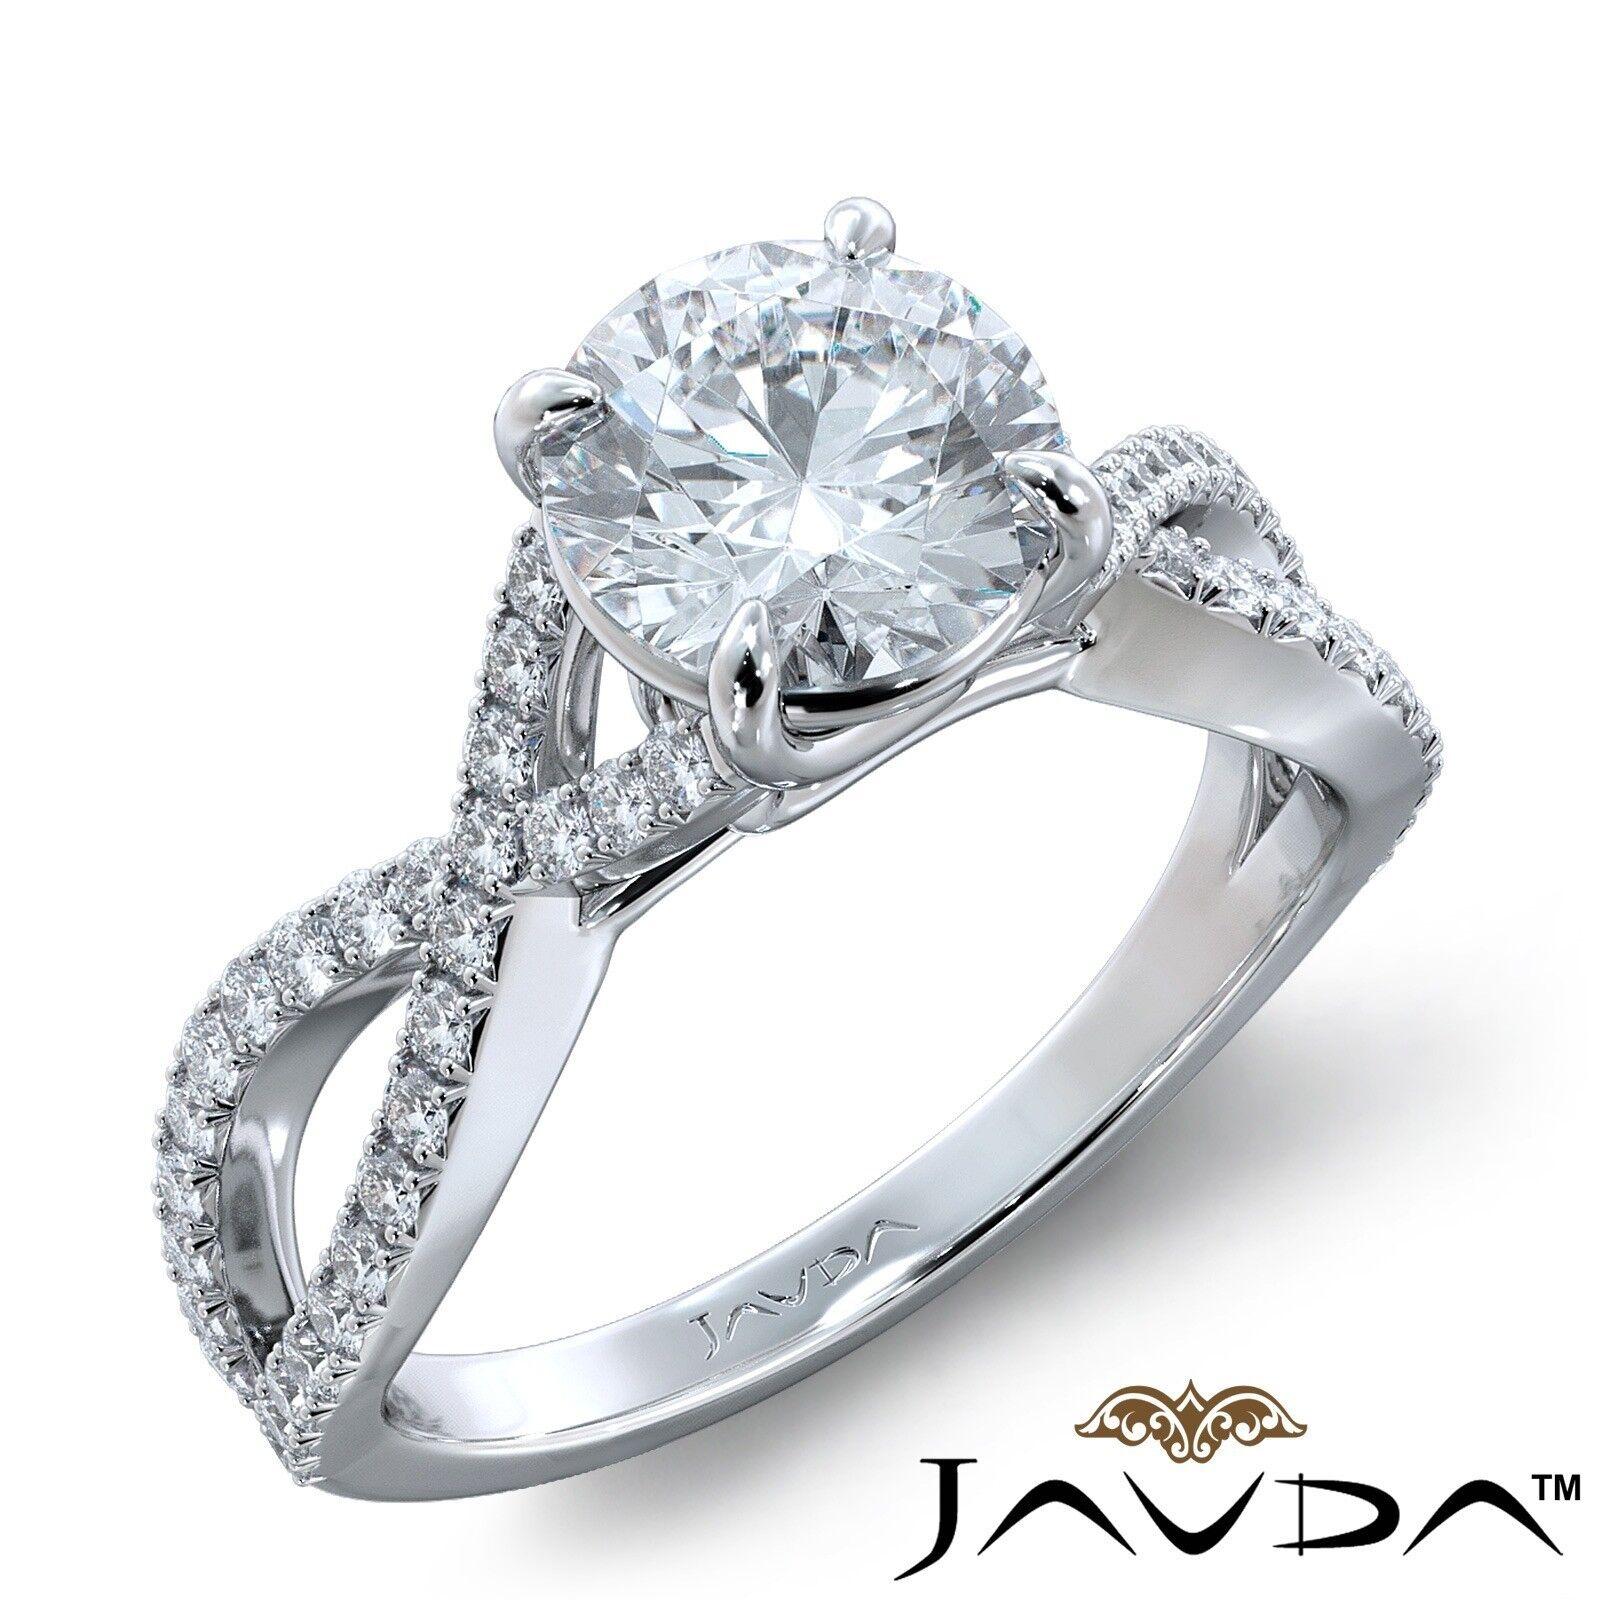 2.74ctw French Pave Sidestone Round Diamond Engagement Ring GIA J-SI1 White Gold